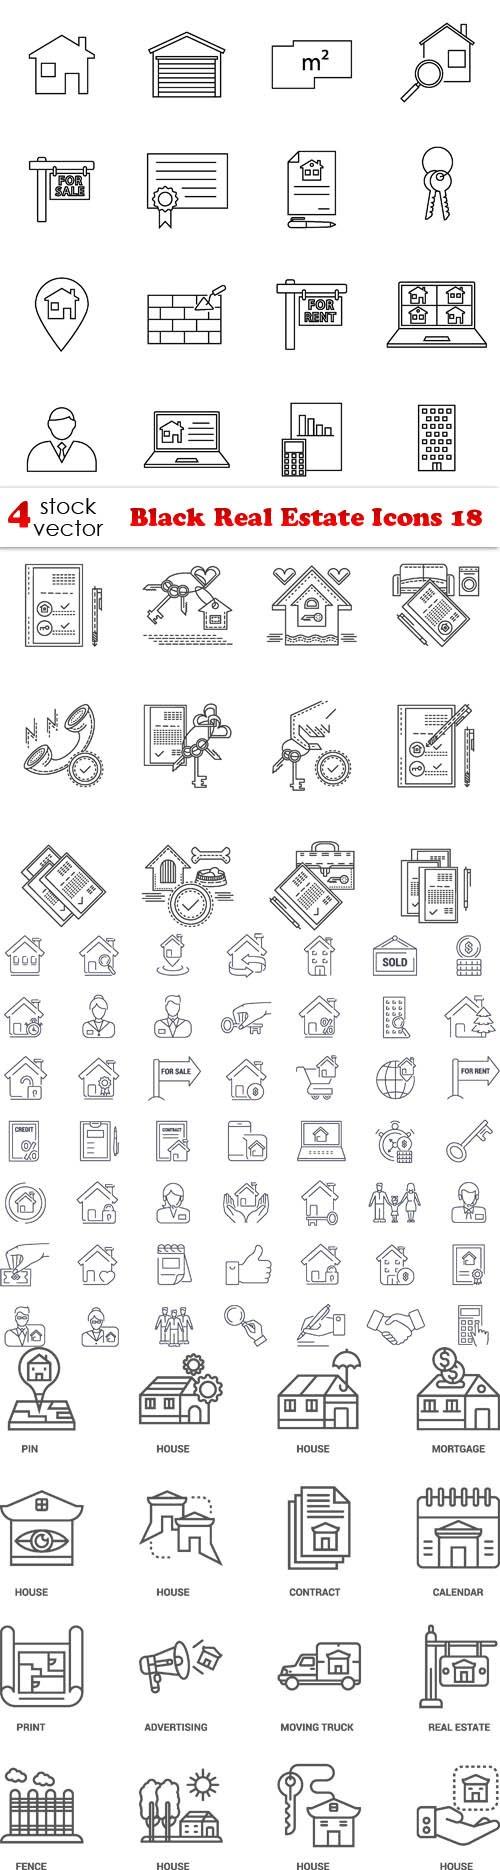 Vectors - Black Real Estate Icons 18